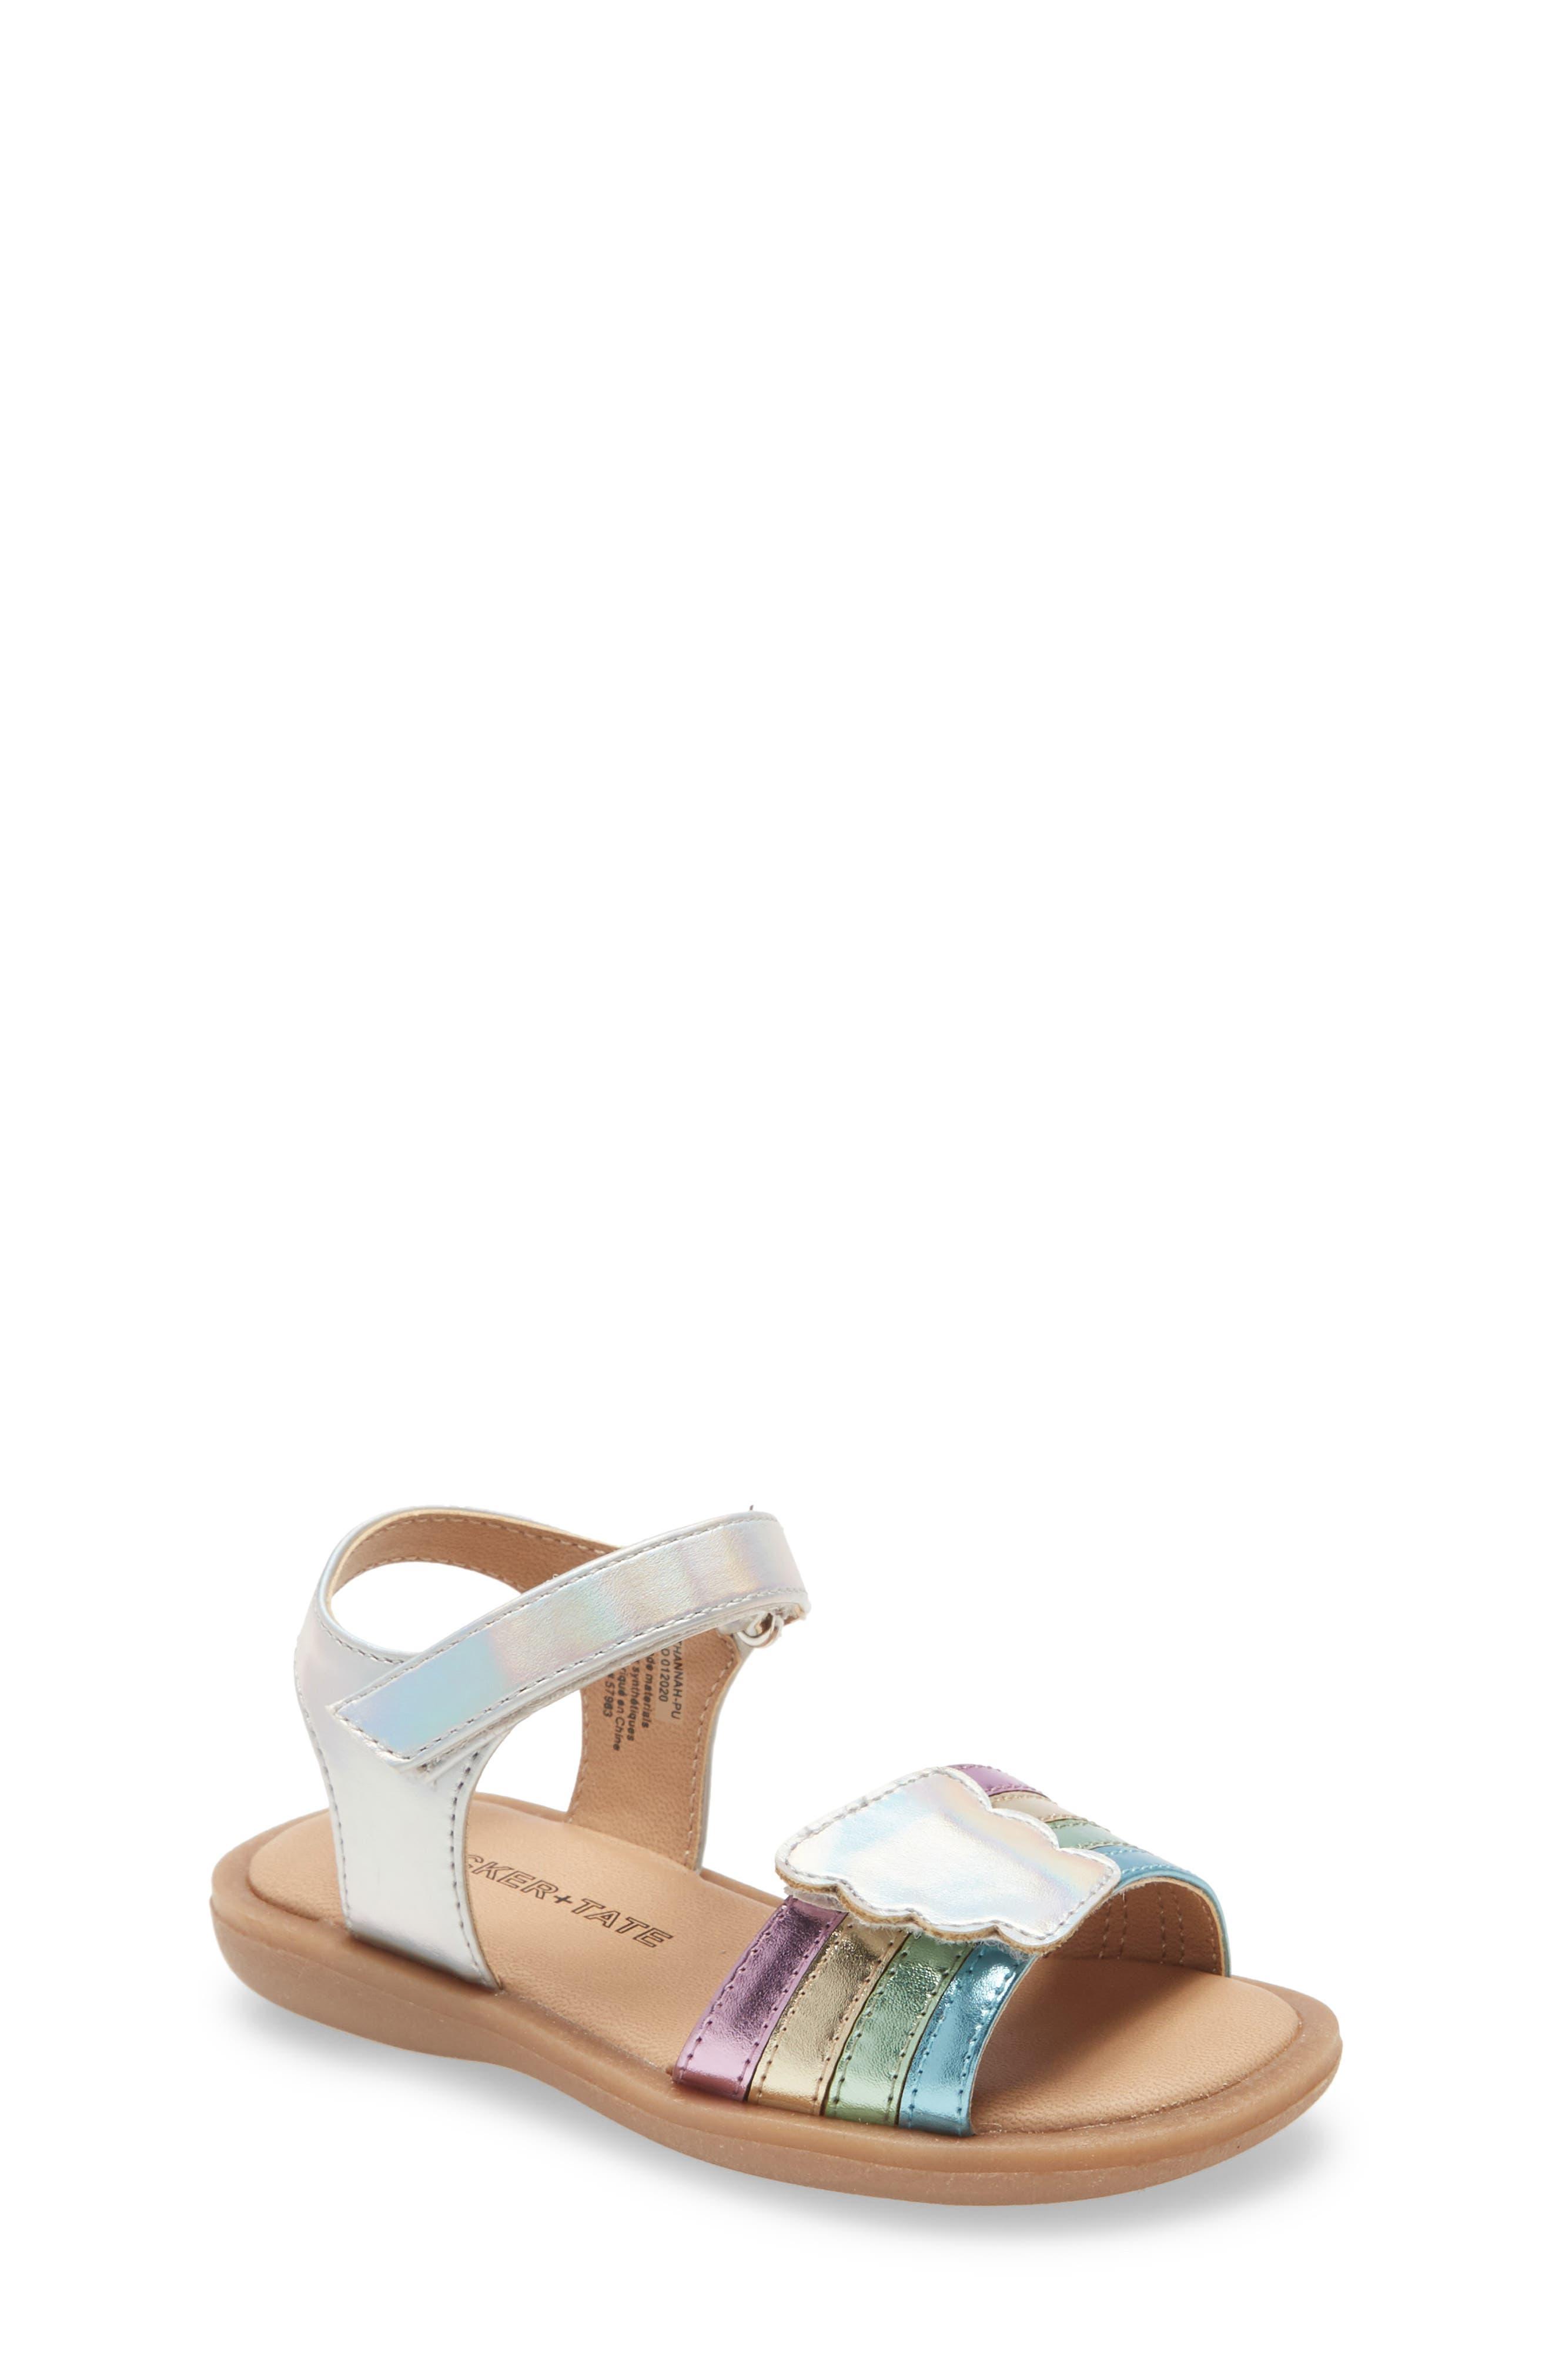 Tucker + Tate Rainbow Sandal (Toddler